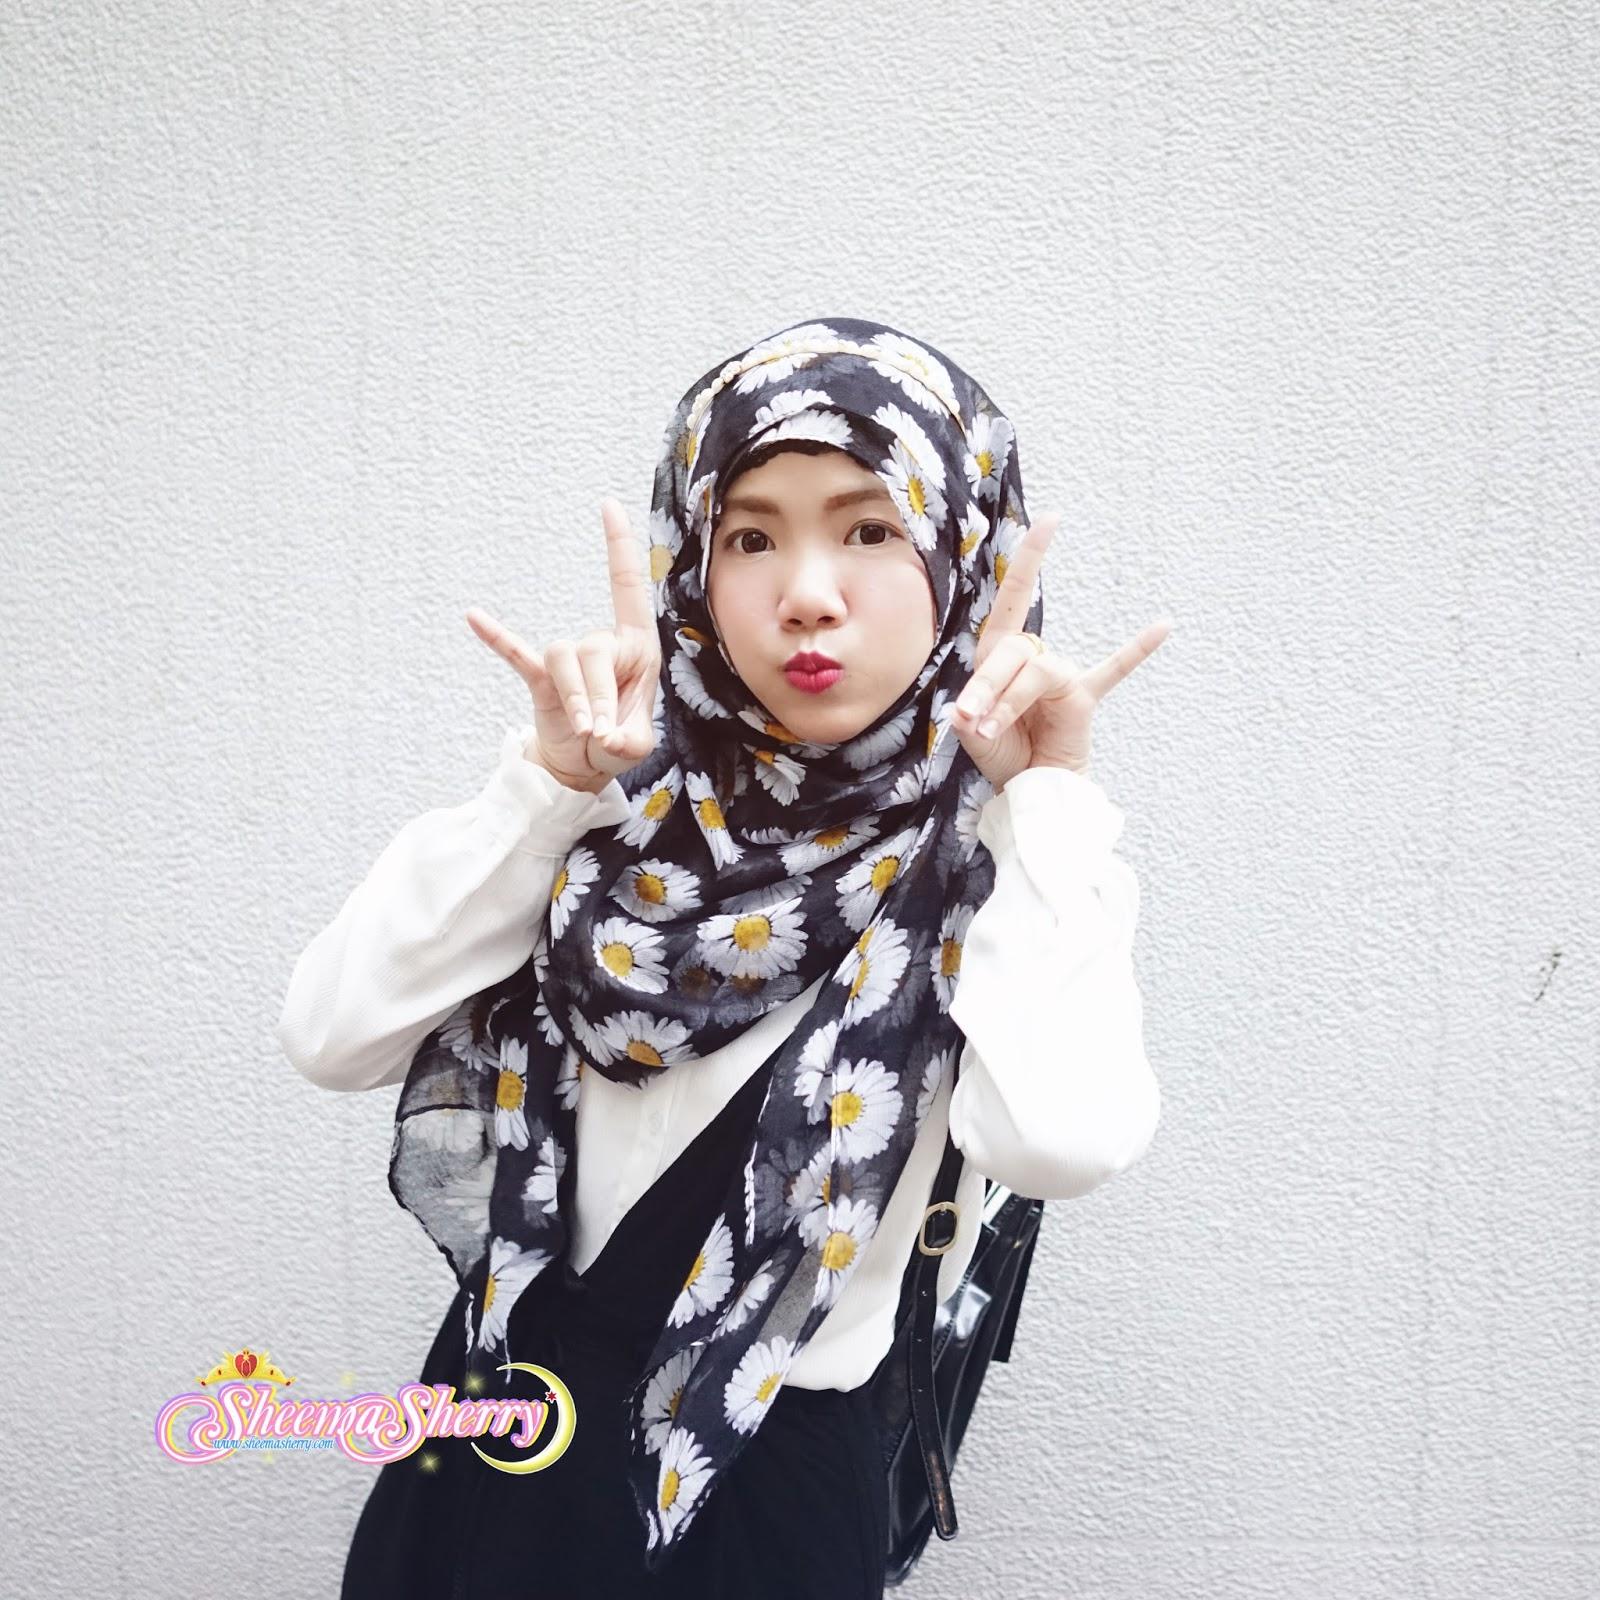 Kawaii Hijabi OOTD Hong Kong Wanchai Married Couple Hijab Cute Larme Kei Travel Travelling Muslim Halal